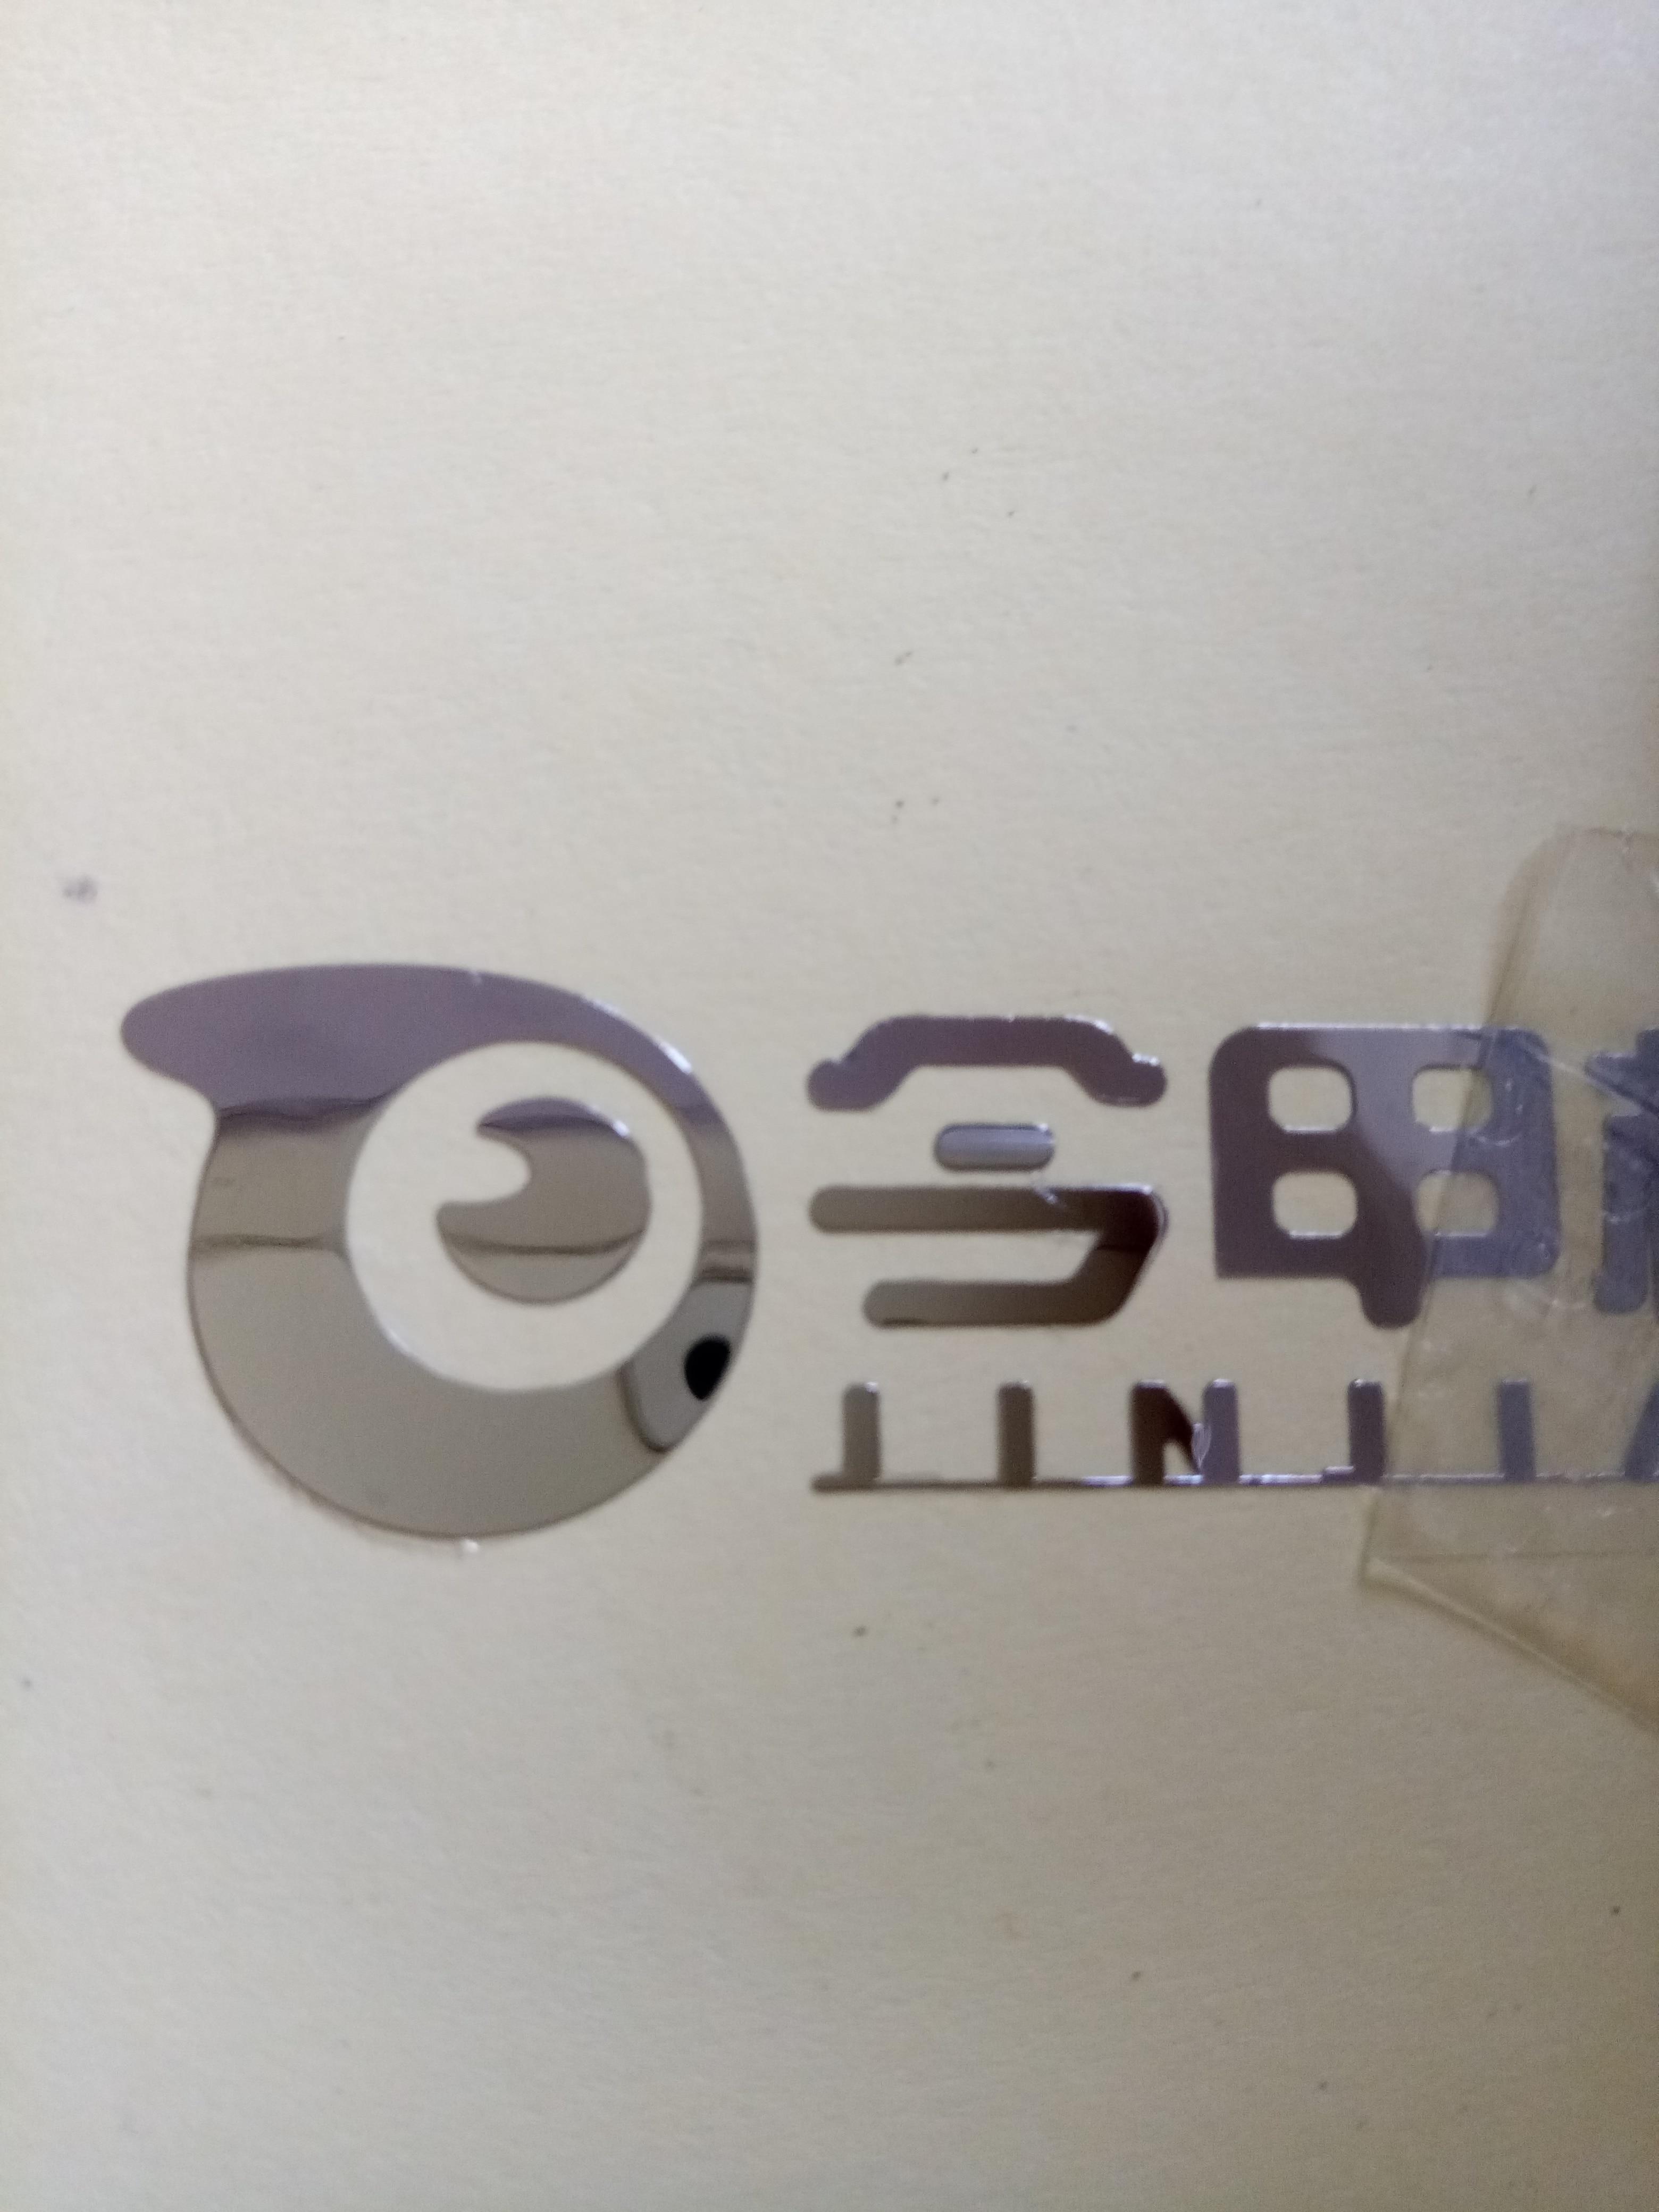 6x3cm silver nickel metal sticker